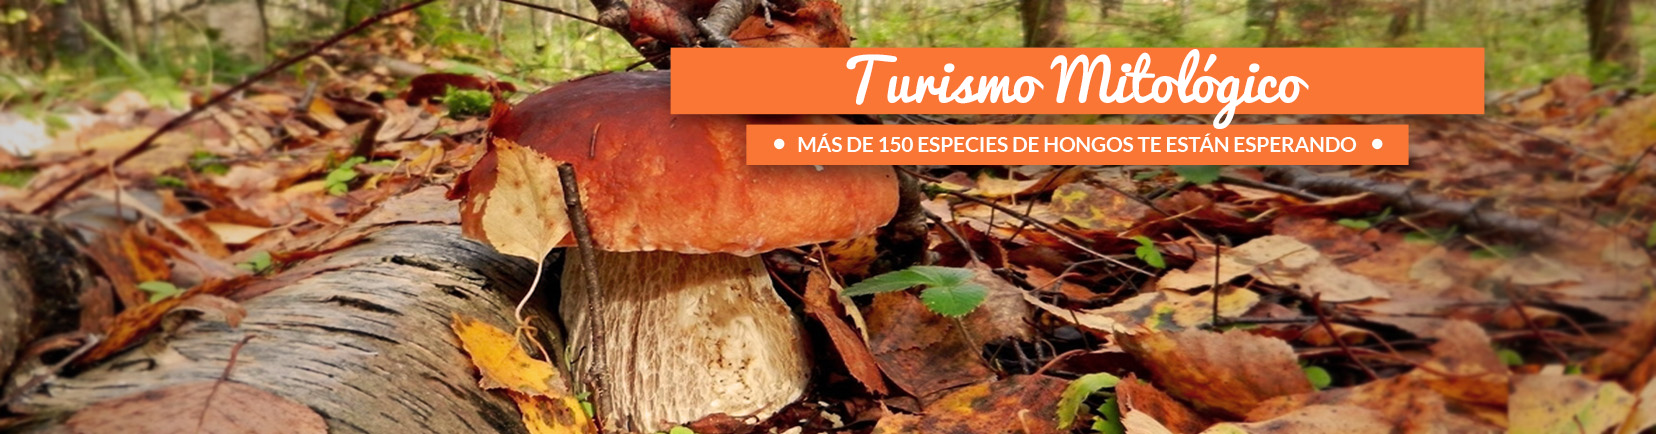 turismo_de_soria_turismo_mitologico